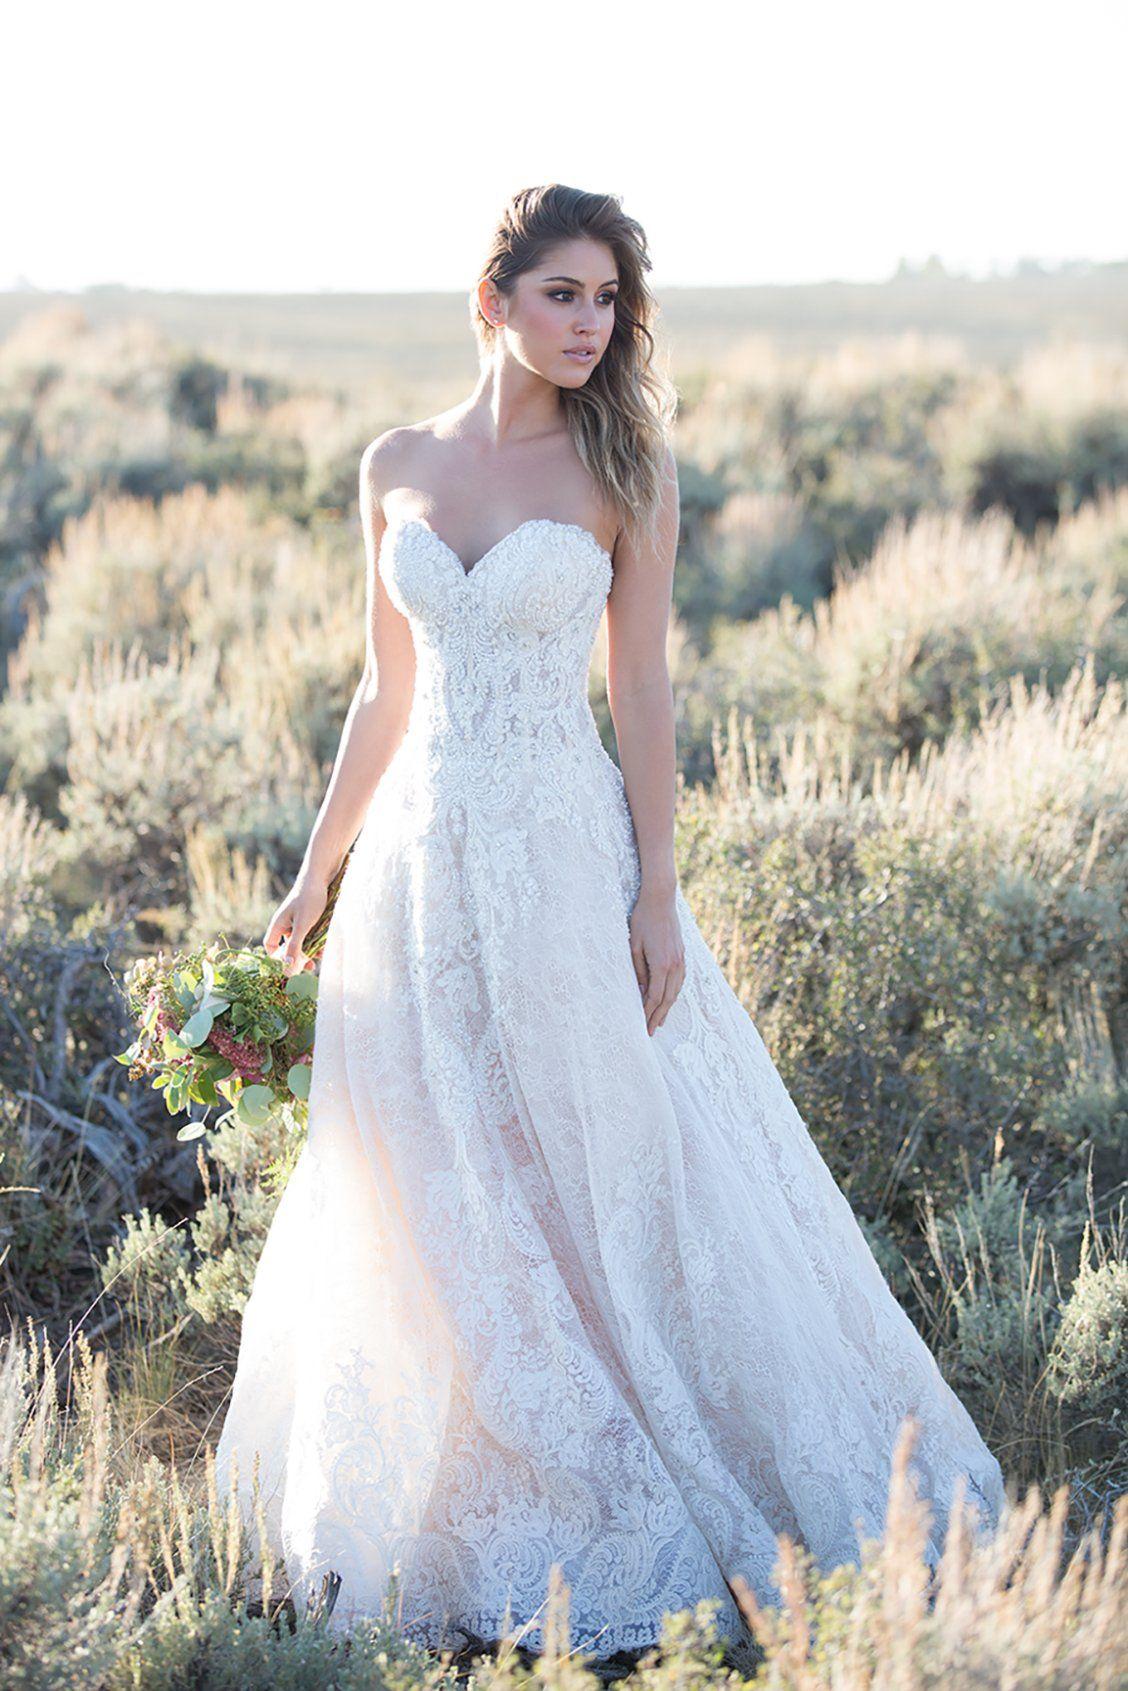 Allure Couture C481 Wedding Dresses Dream Wedding Dresses